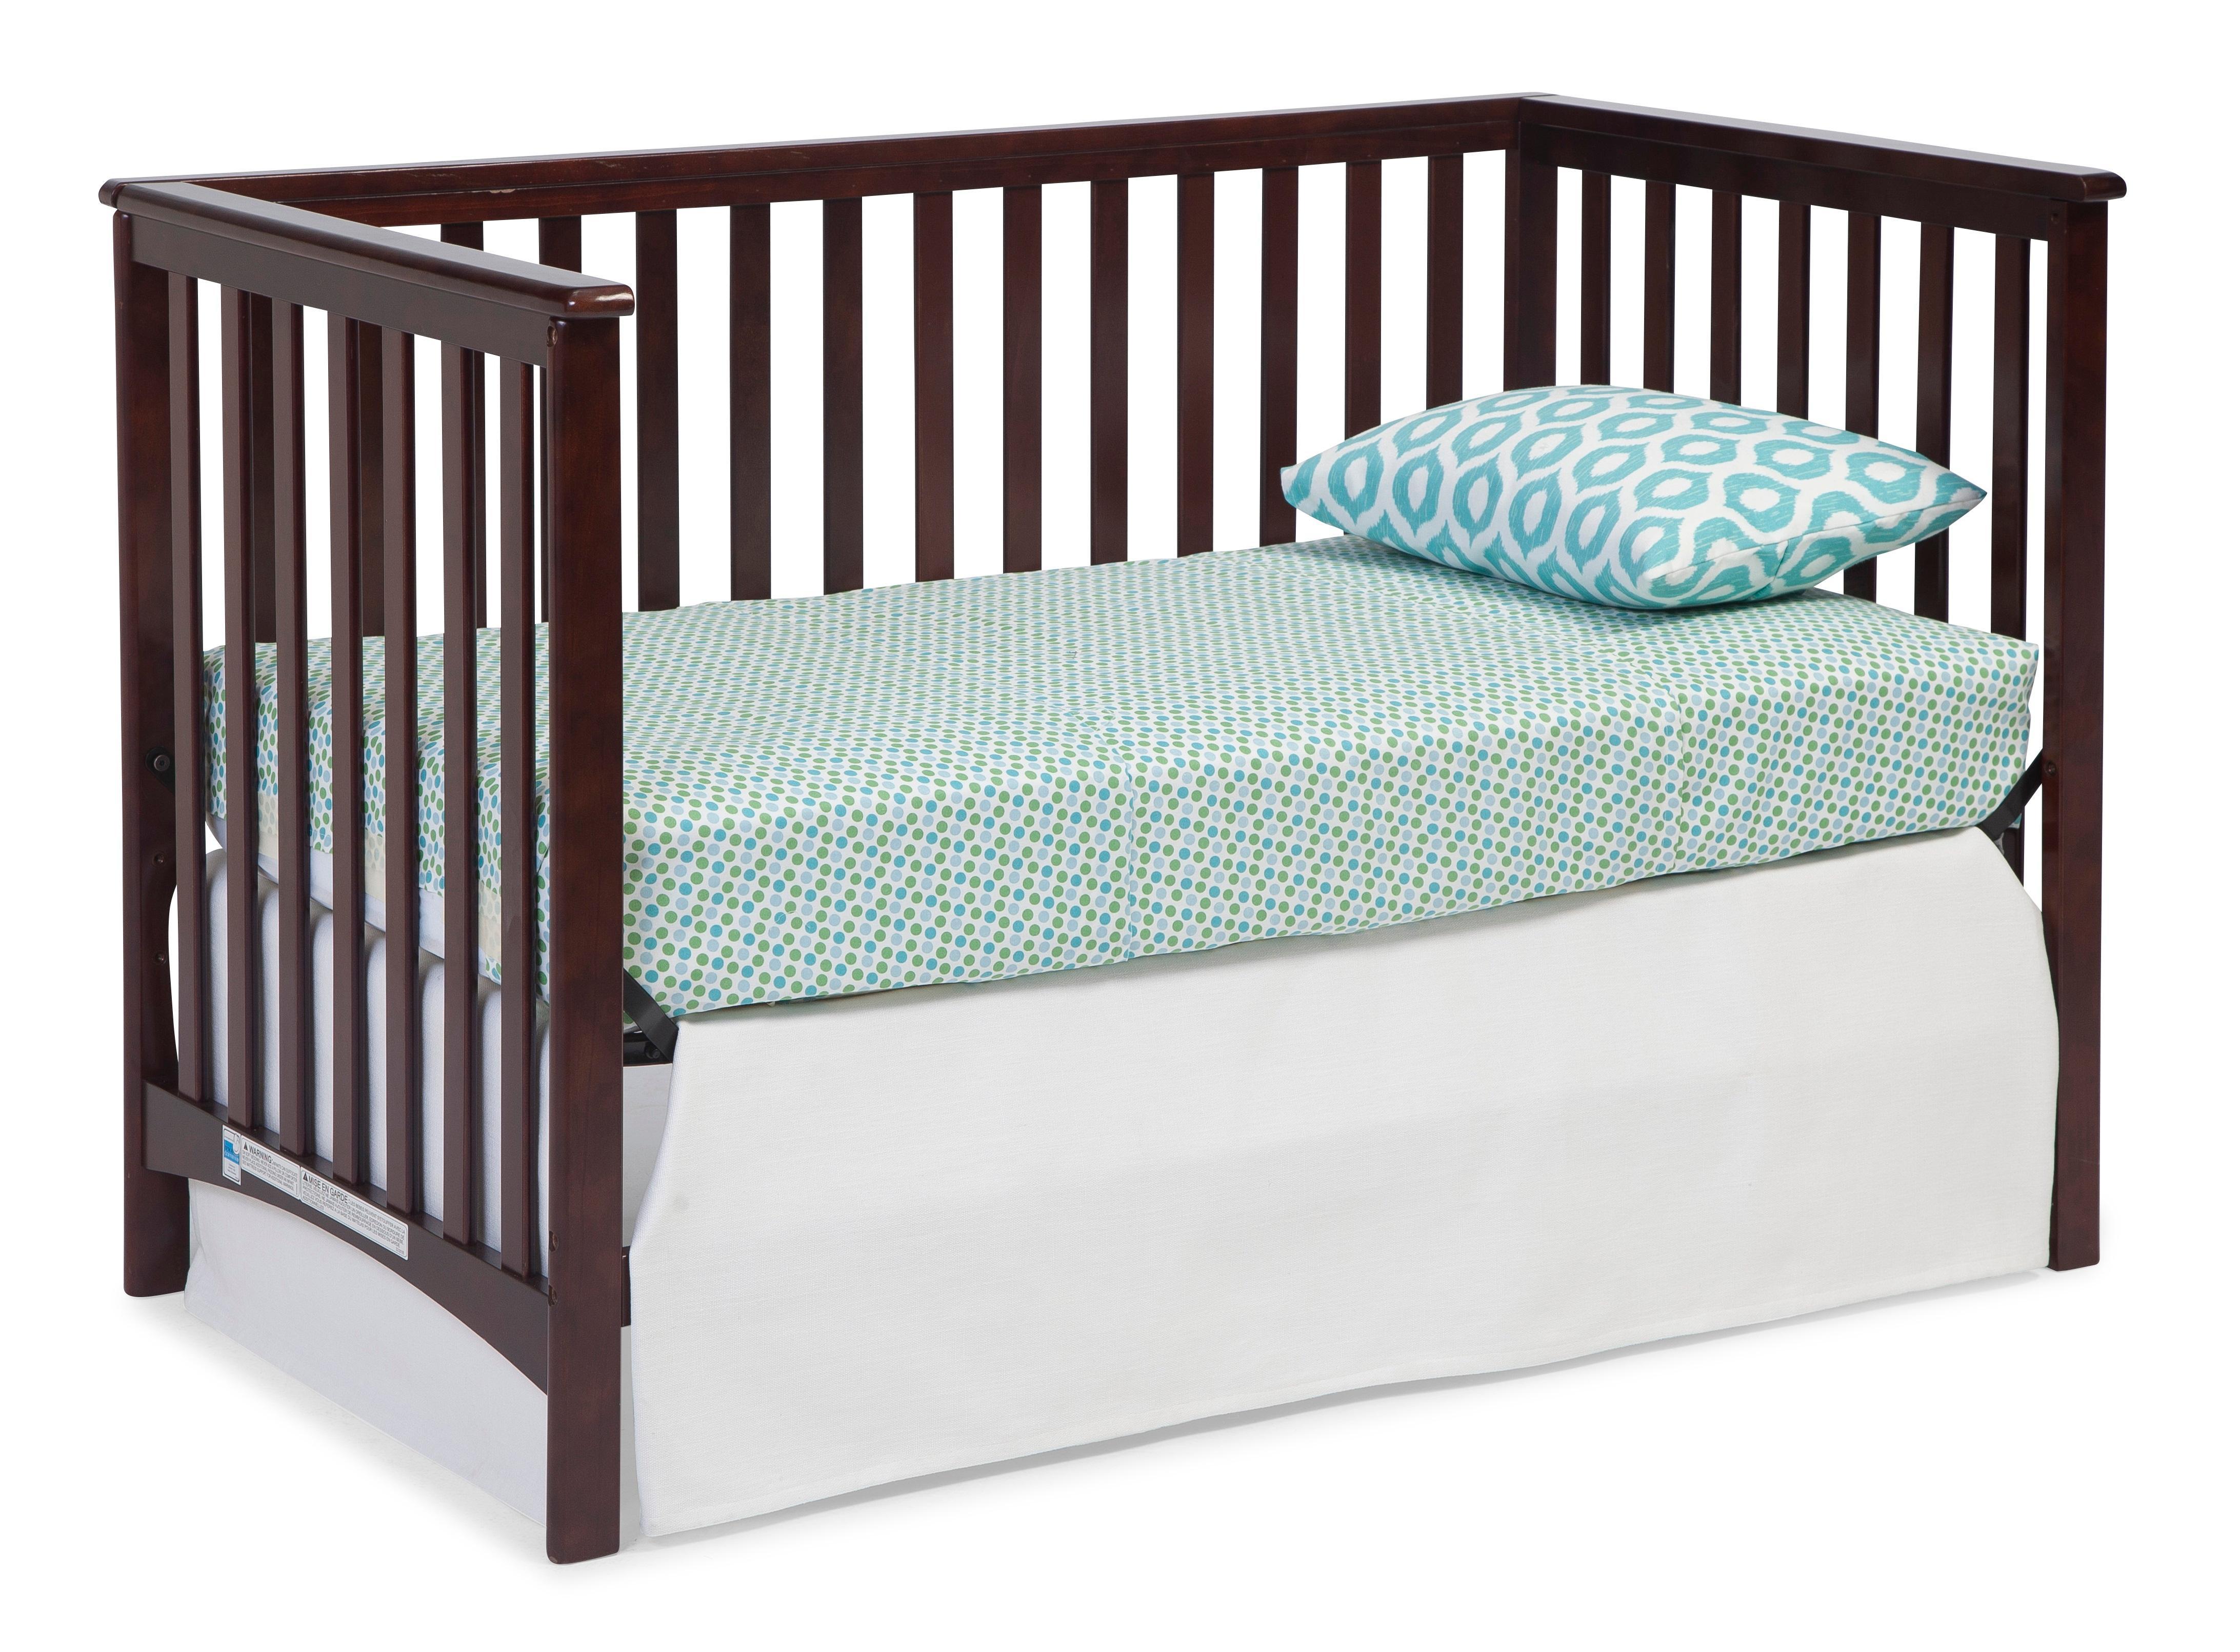 Storkcraft Hillcrest 4 In 1 Convertible Crib Gray Amazon